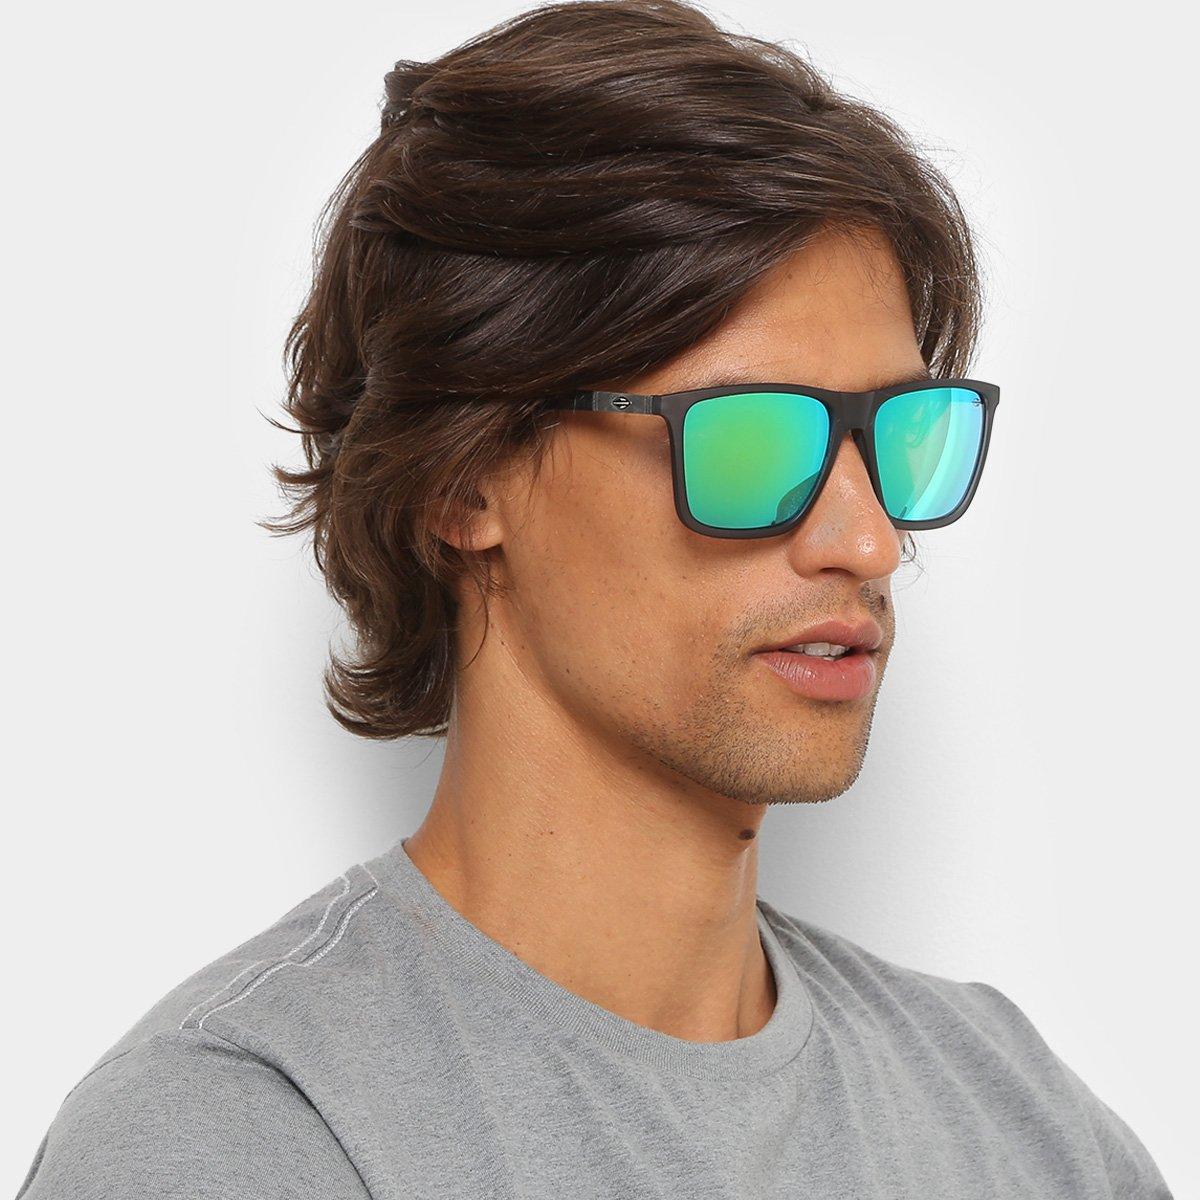 b893ffa38300c Óculos de Sol Mormaii Hawaii Masculino - Preto - Compre Agora   Zattini